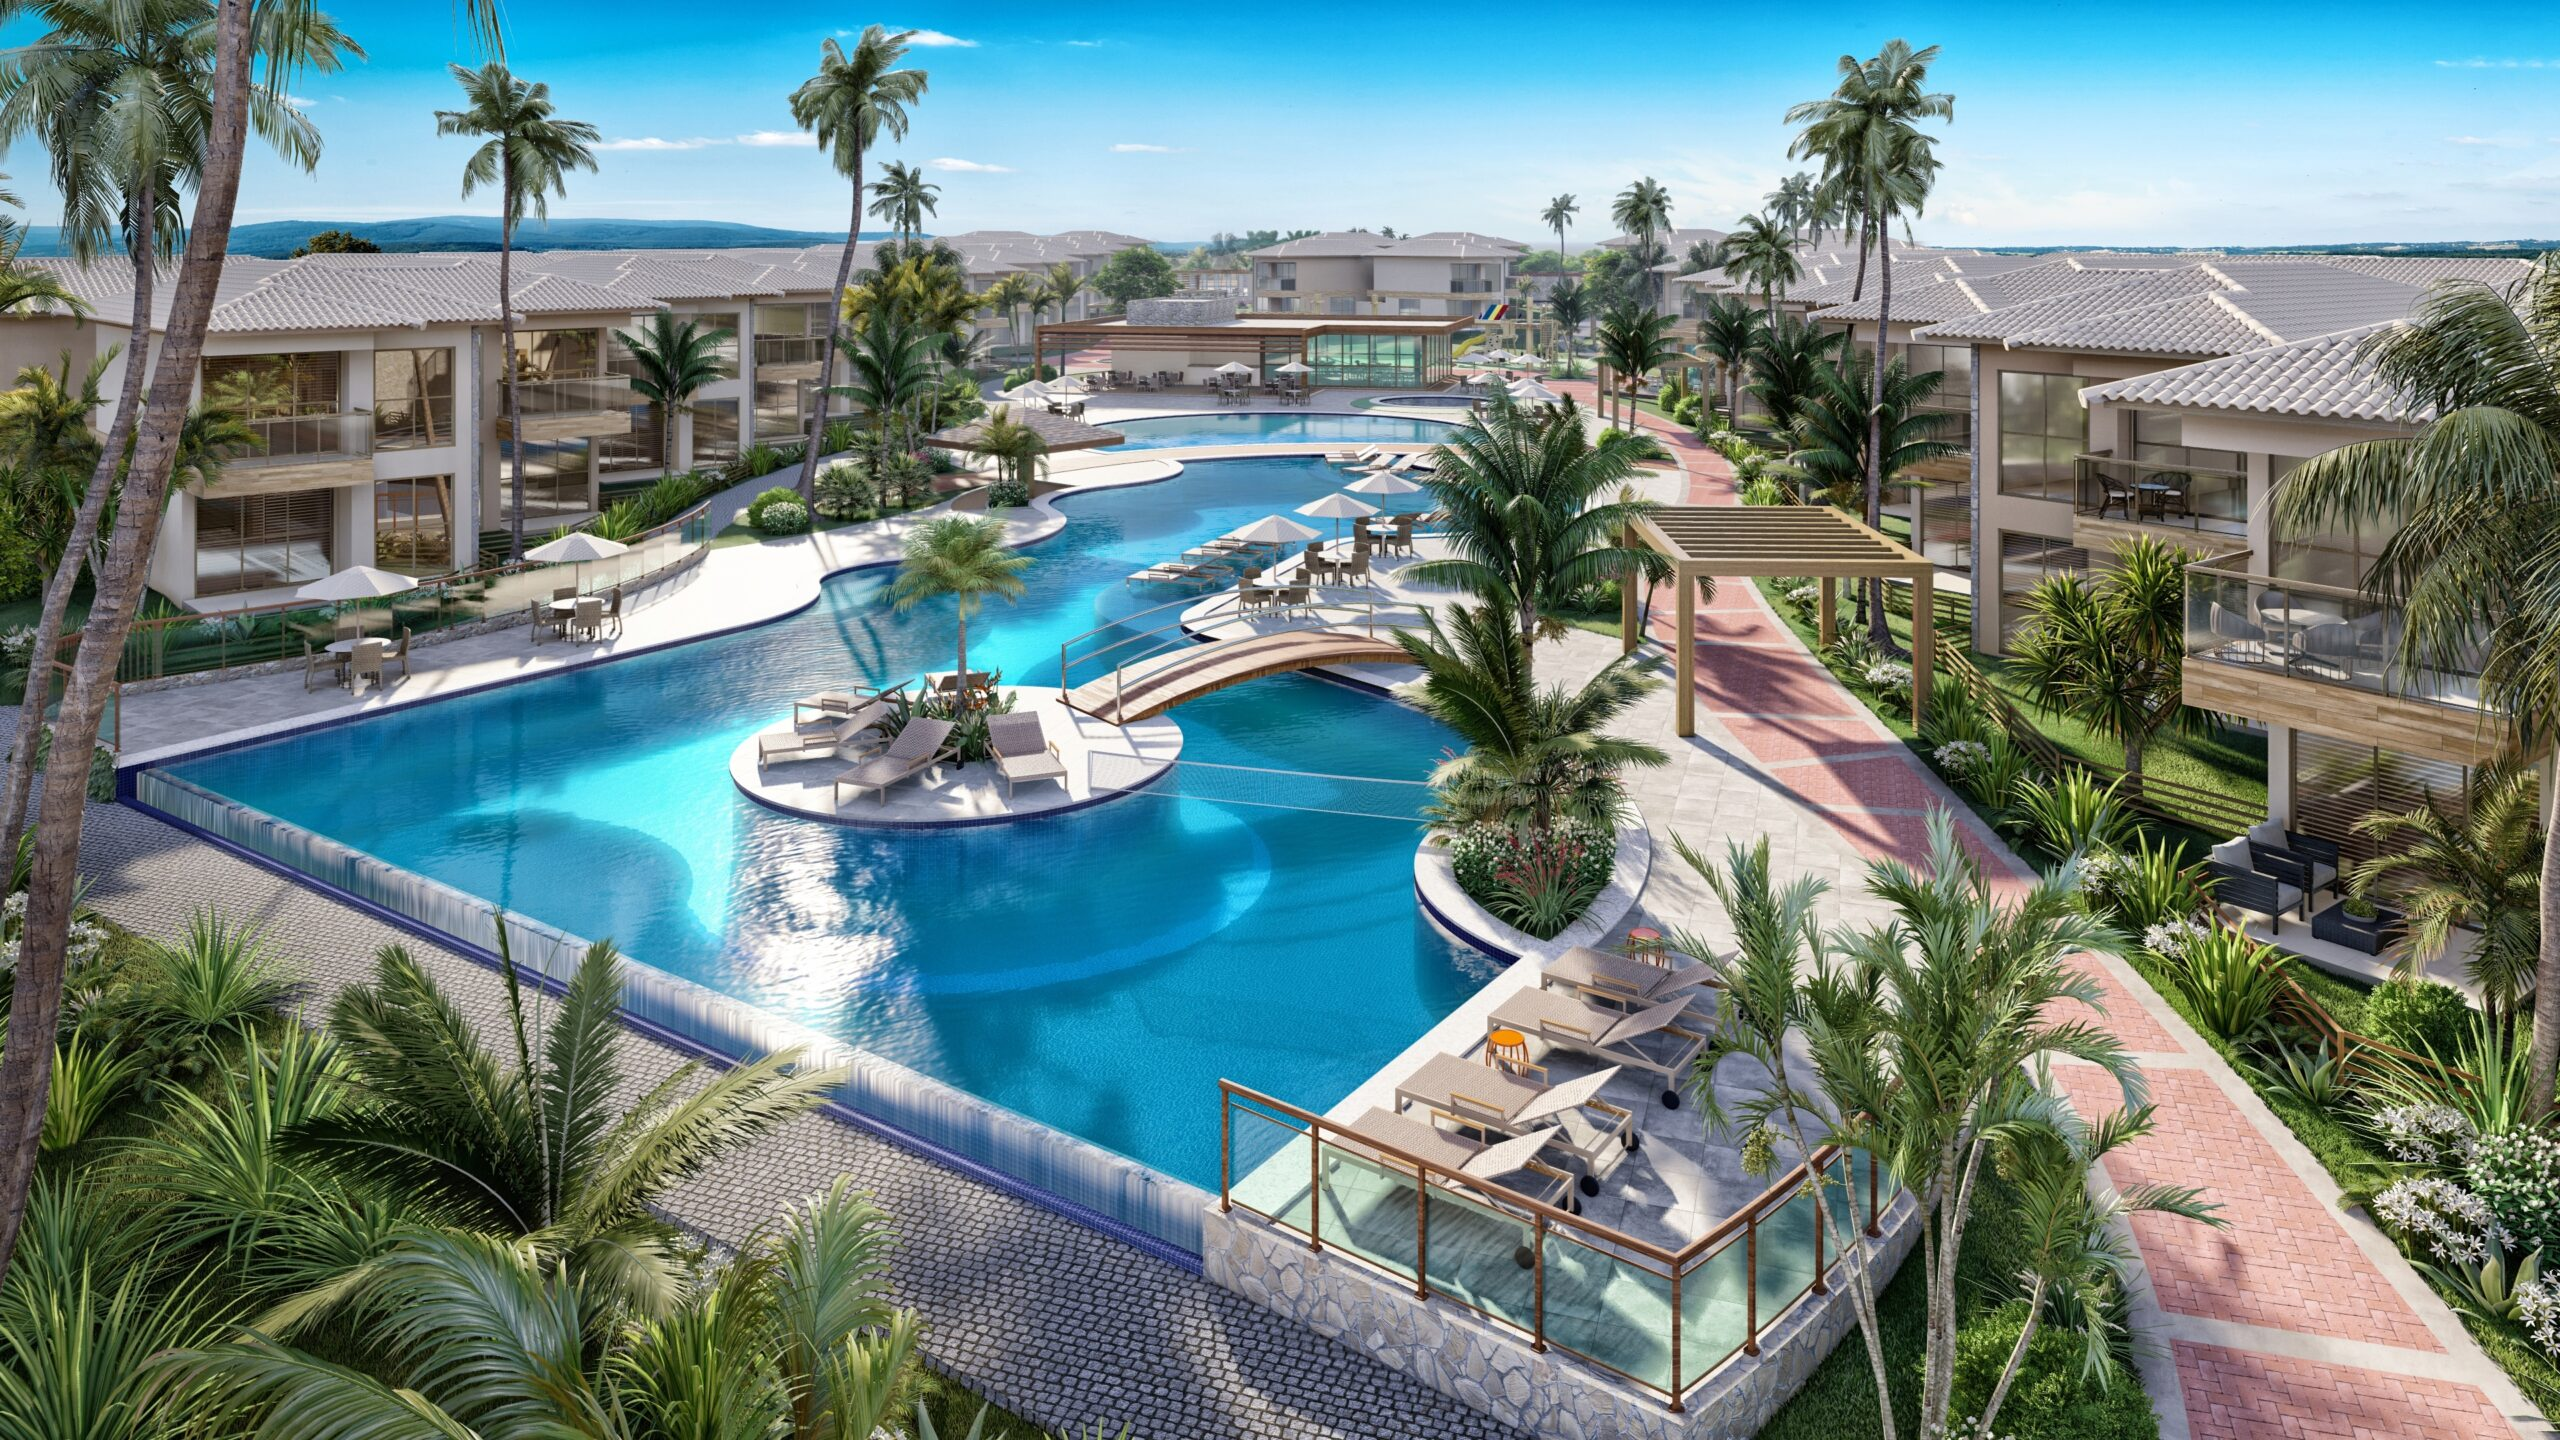 Perspectiva da piscina resort do Guarajuba Ville